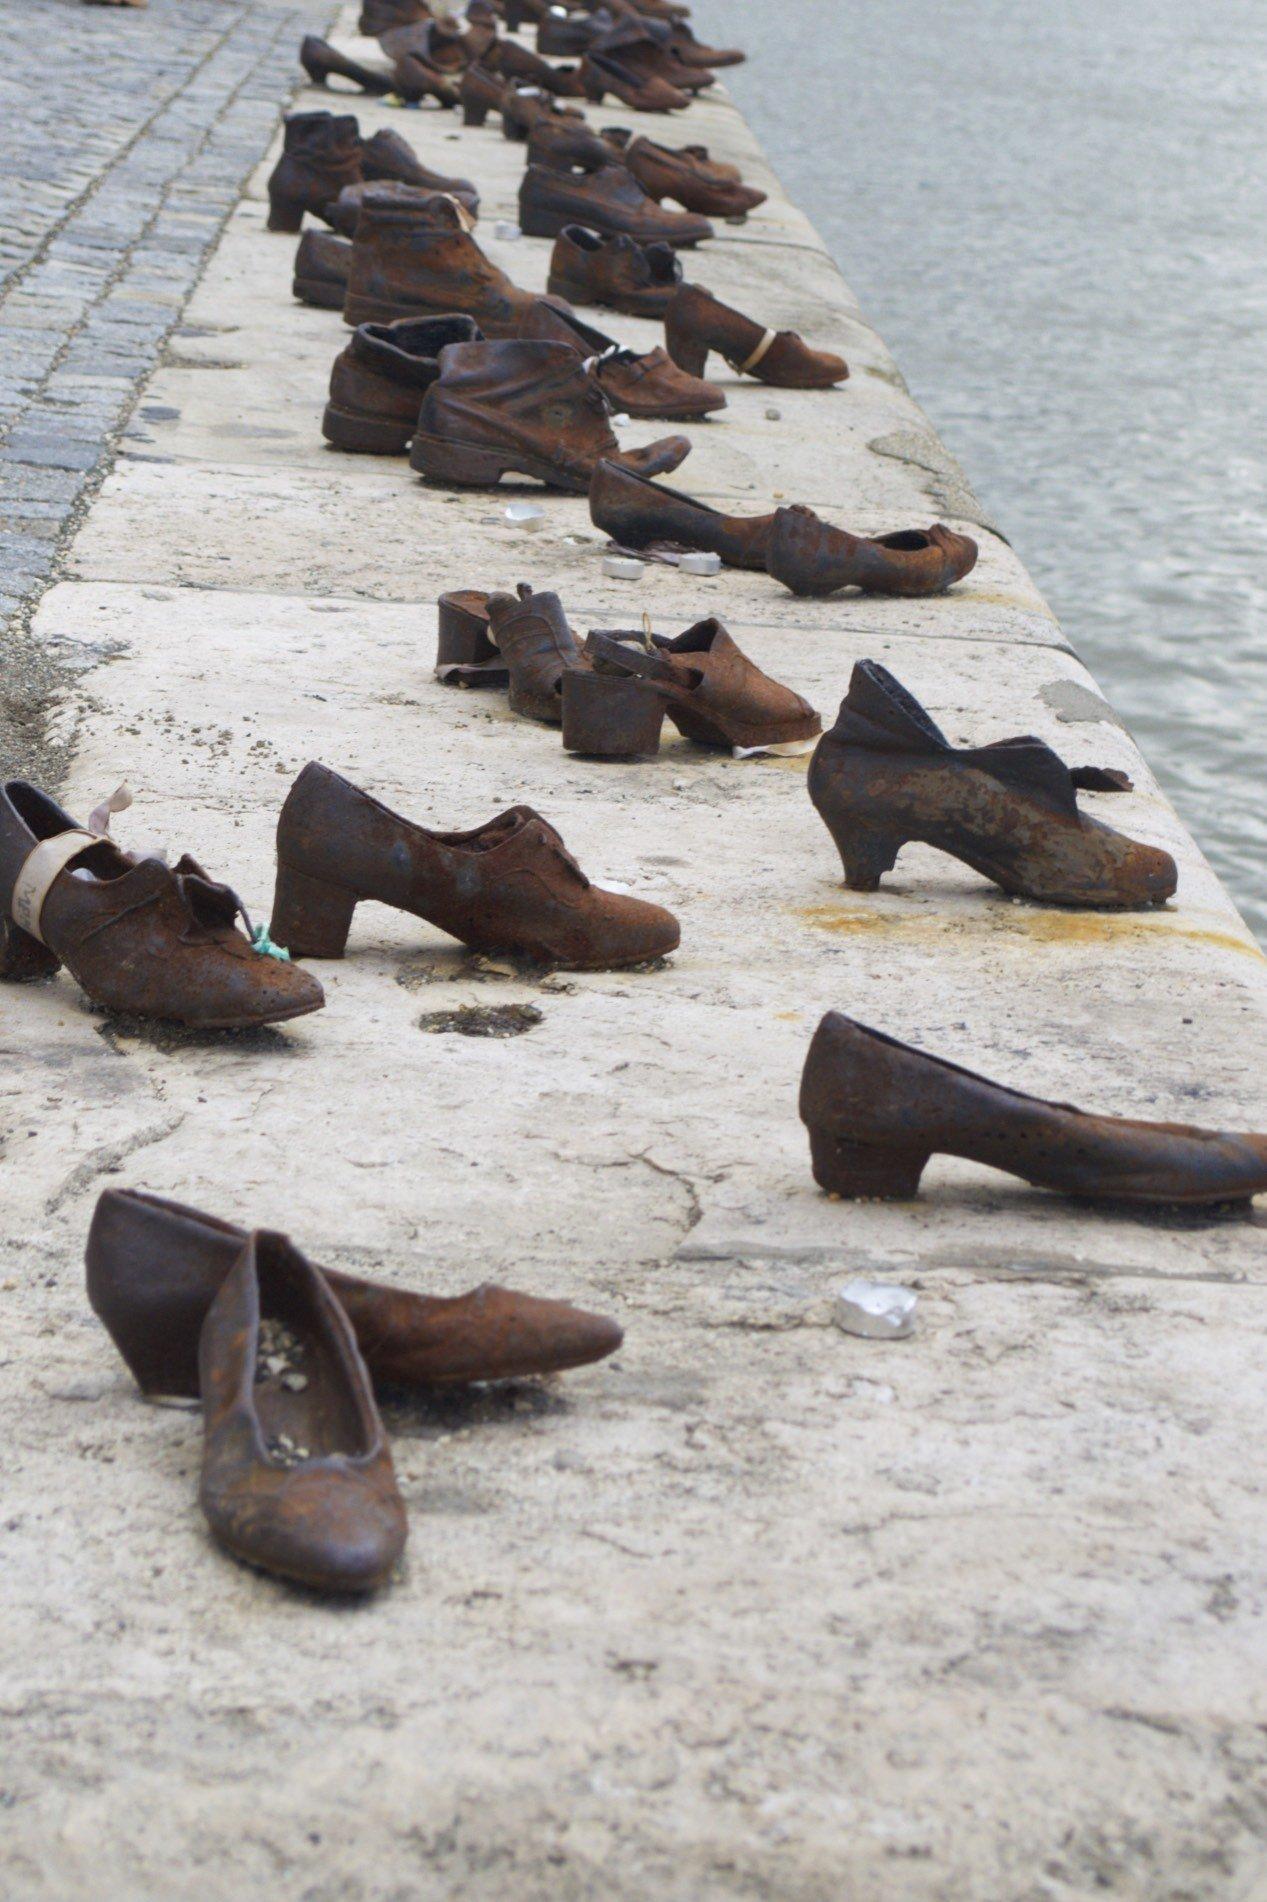 Mahnmal Schuhe am Donauufer Budapest